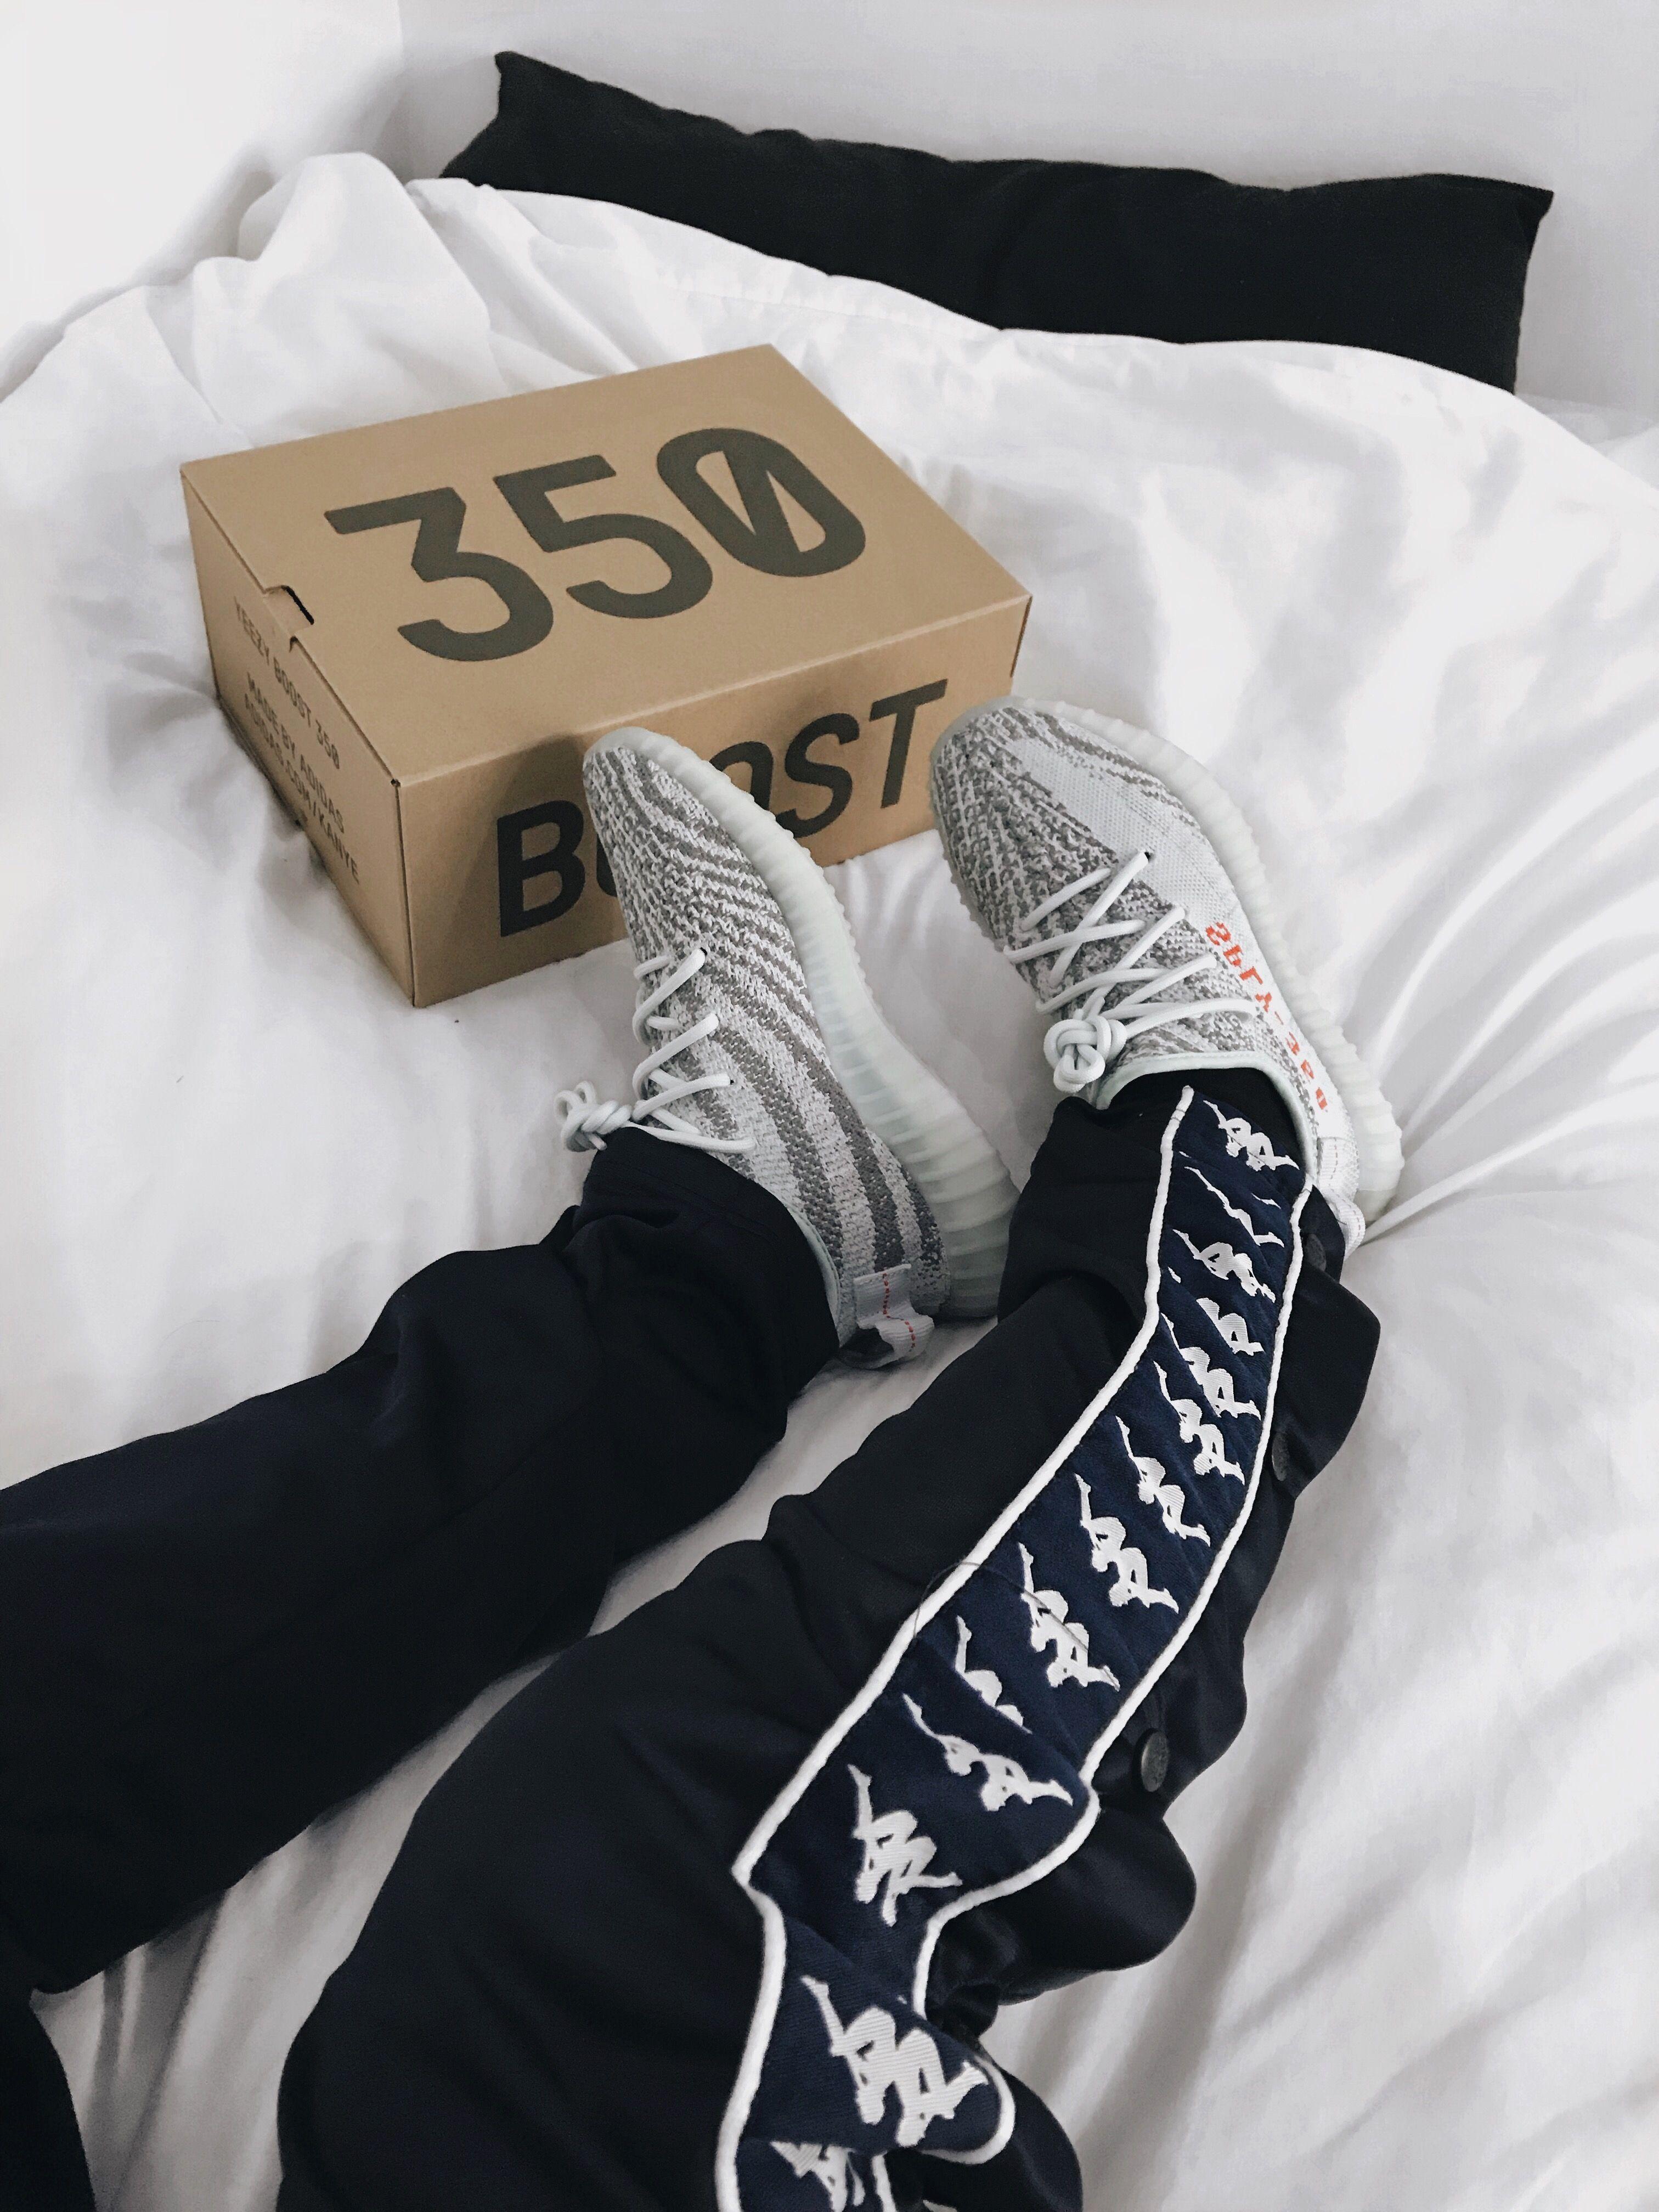 Adidas Yeezy Boost 350 V2 Blue Tint Sneakers    Kappa    Sam Barnes ... c7bcbf3ea